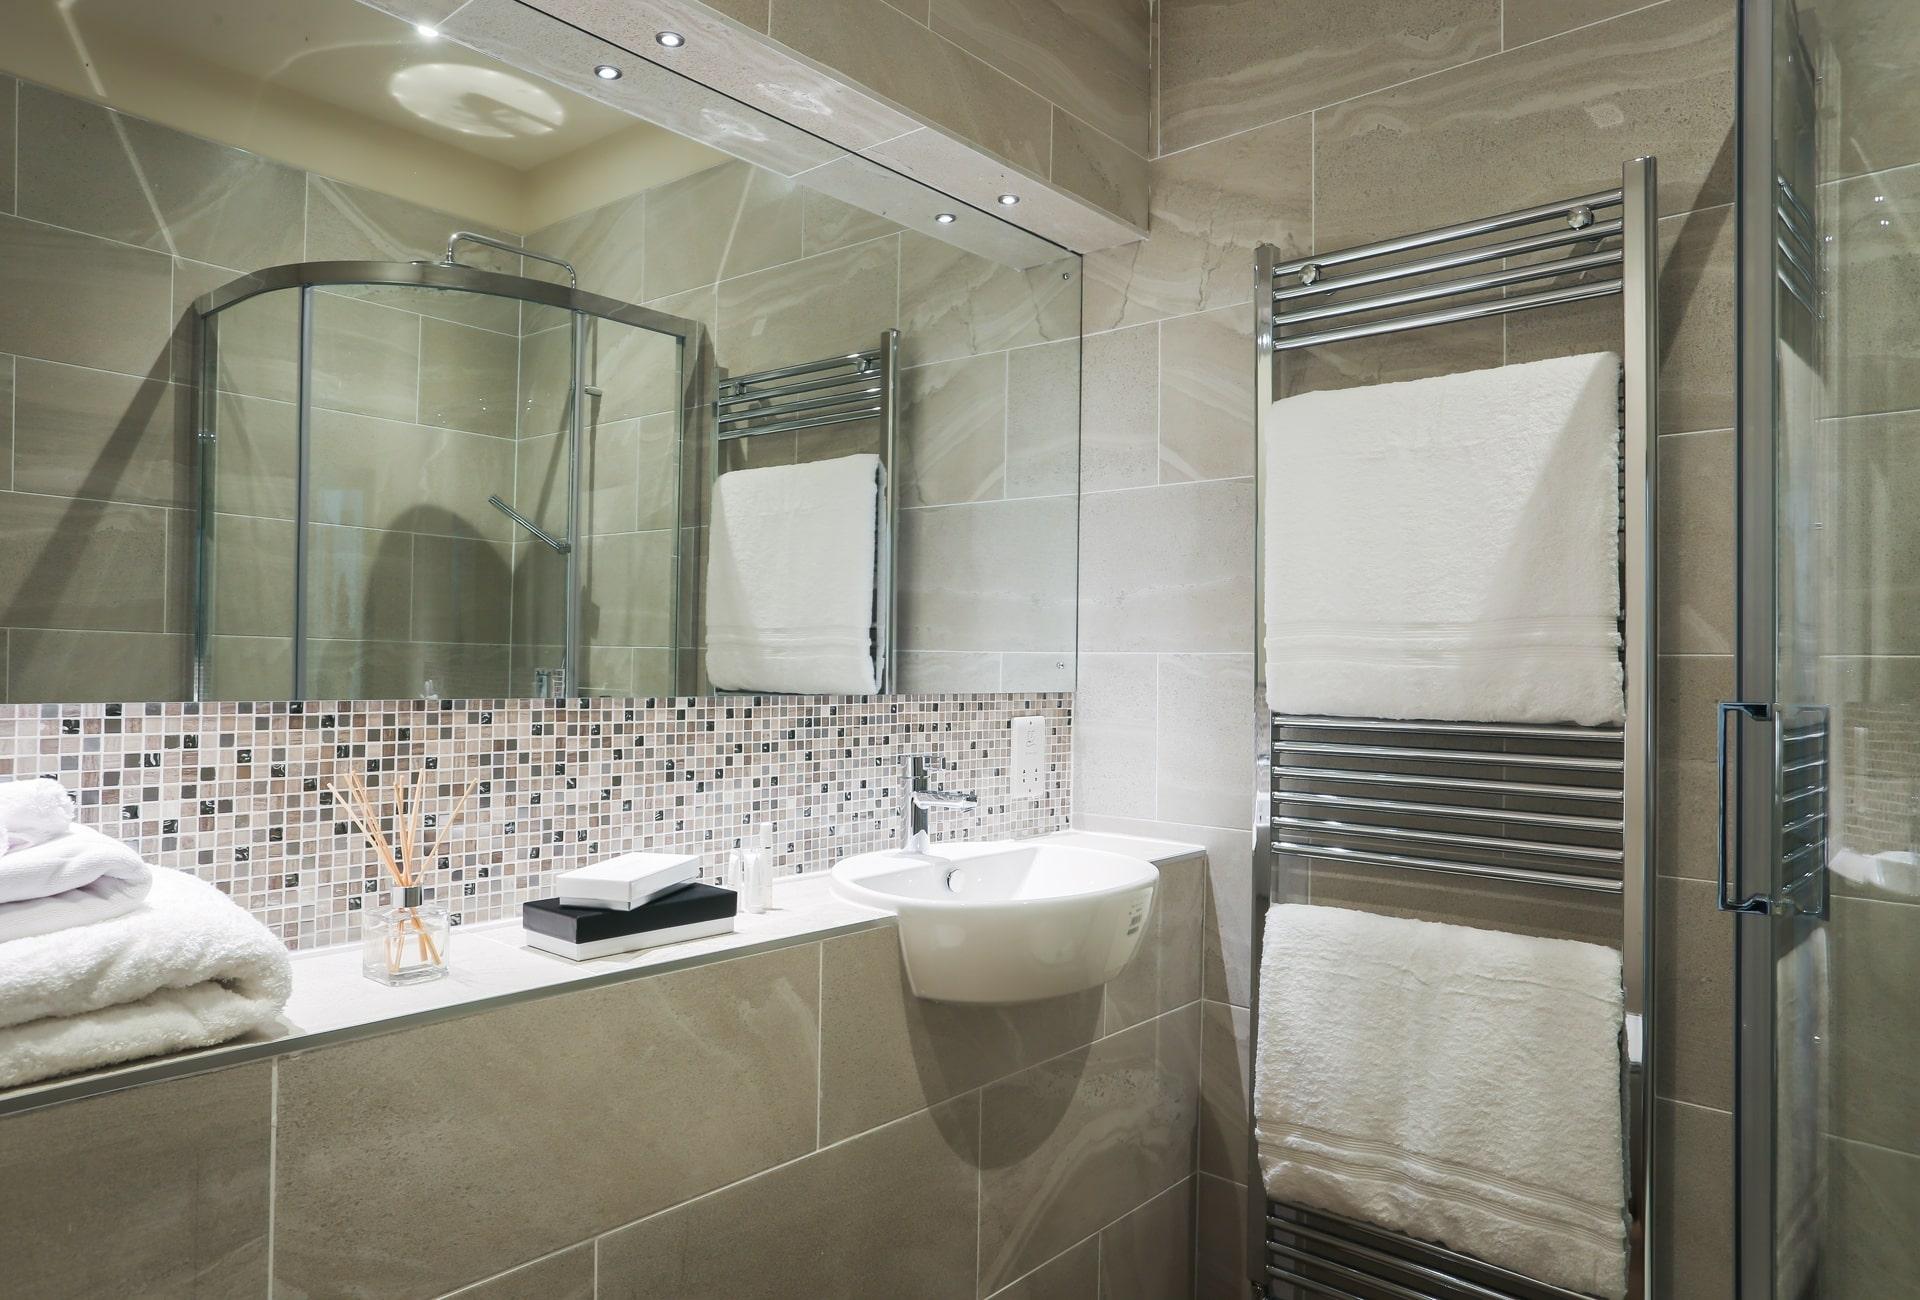 C+S Boutique Hotel, South Yorkshire Interior Design